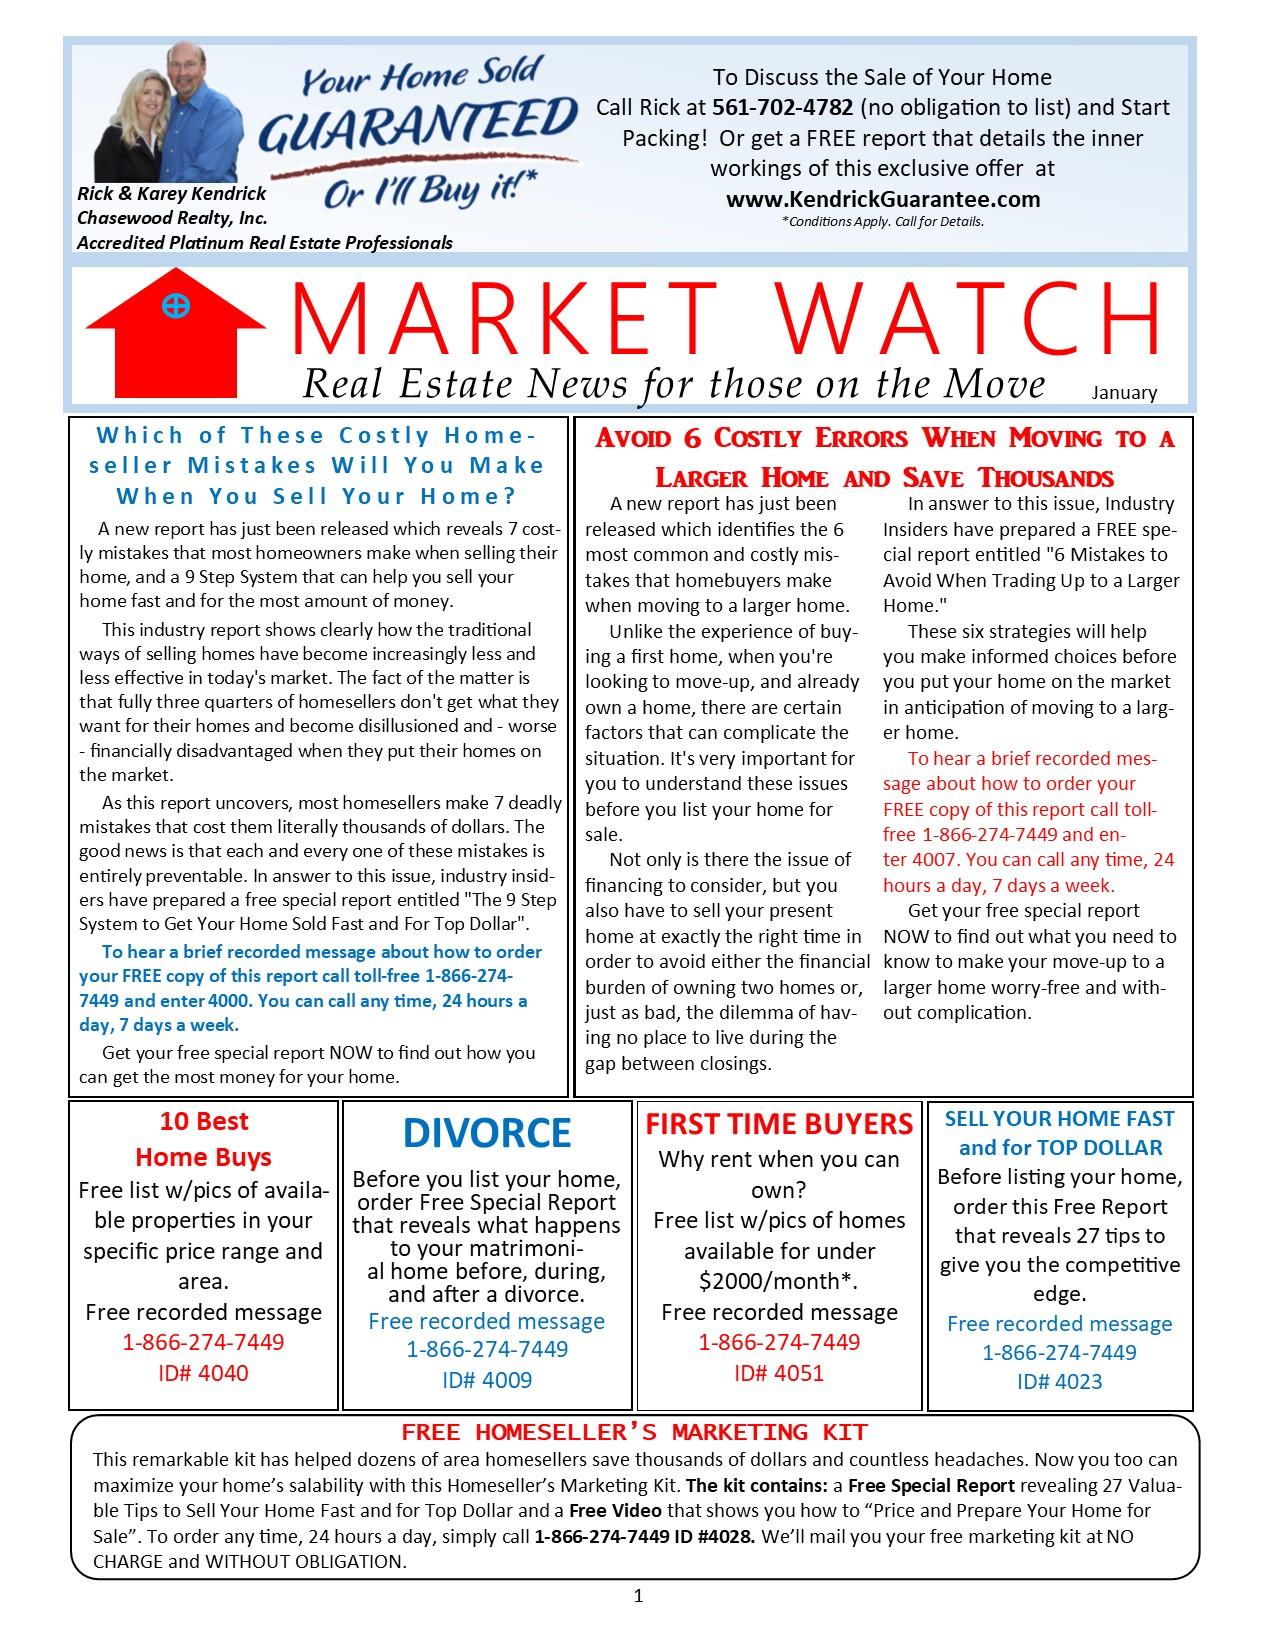 MarketWatch Newsletter - January